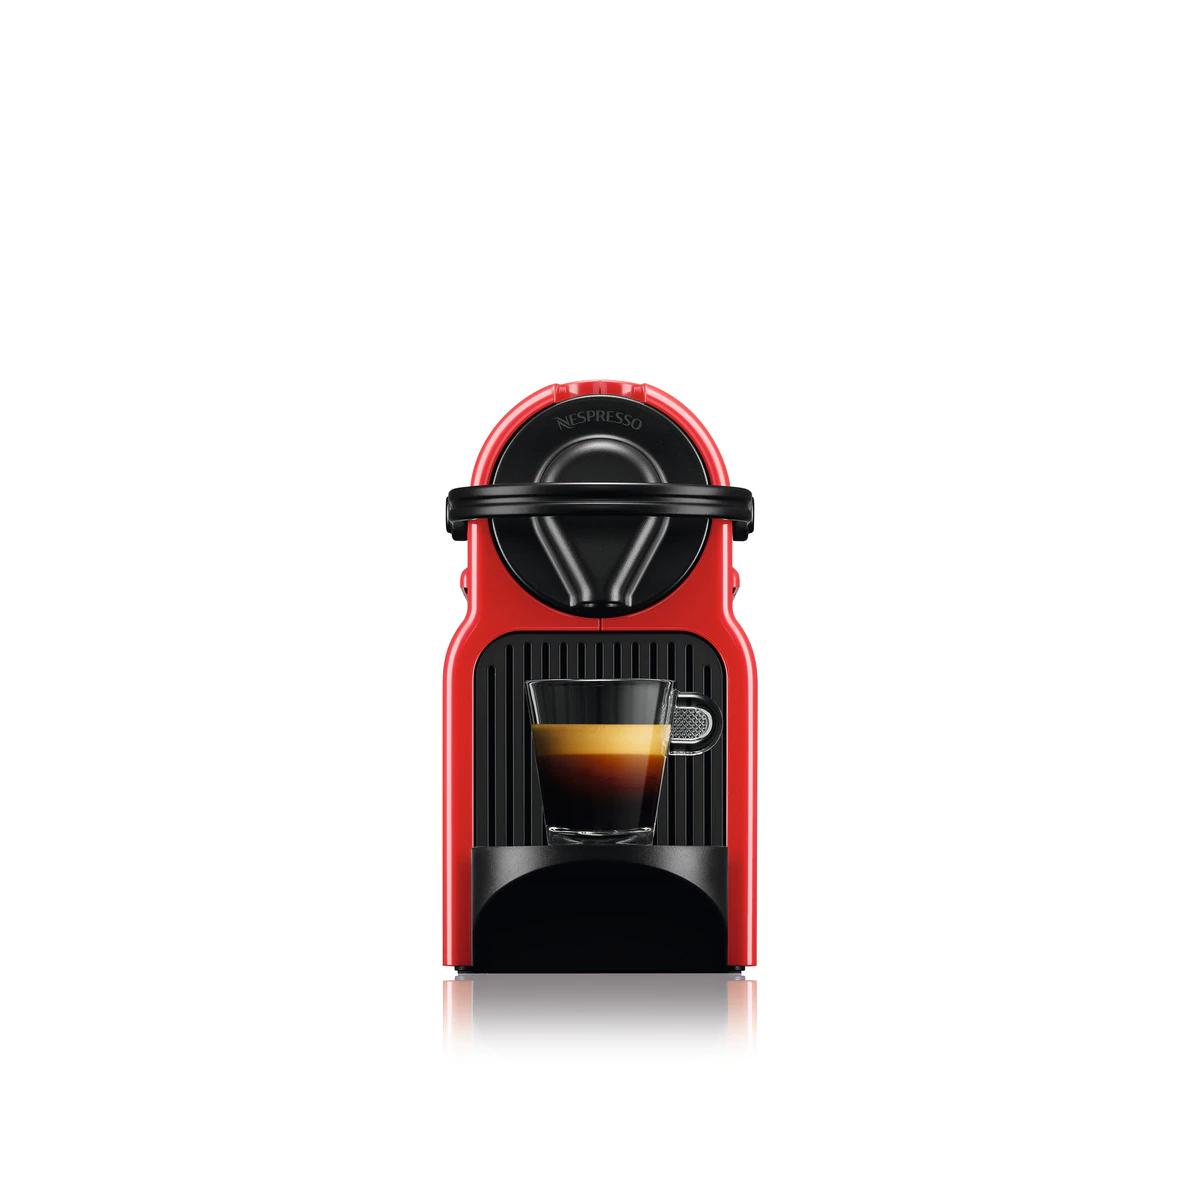 40% de descuento en Cafetera espresso automática Krups Inissia Red para cápsulas NESPRESSO